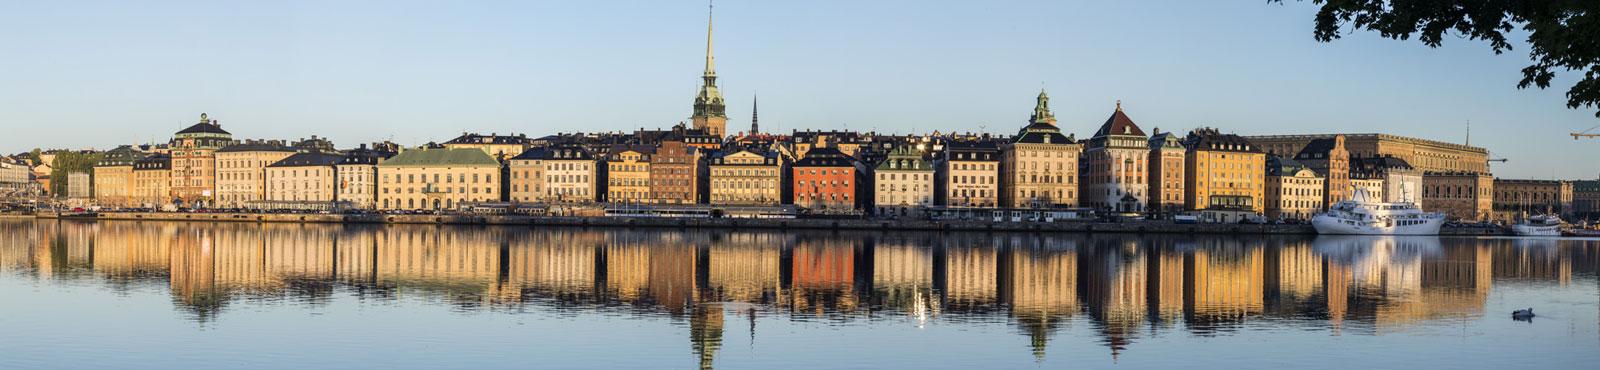 copyright Trygg-imagebank.sweden.se